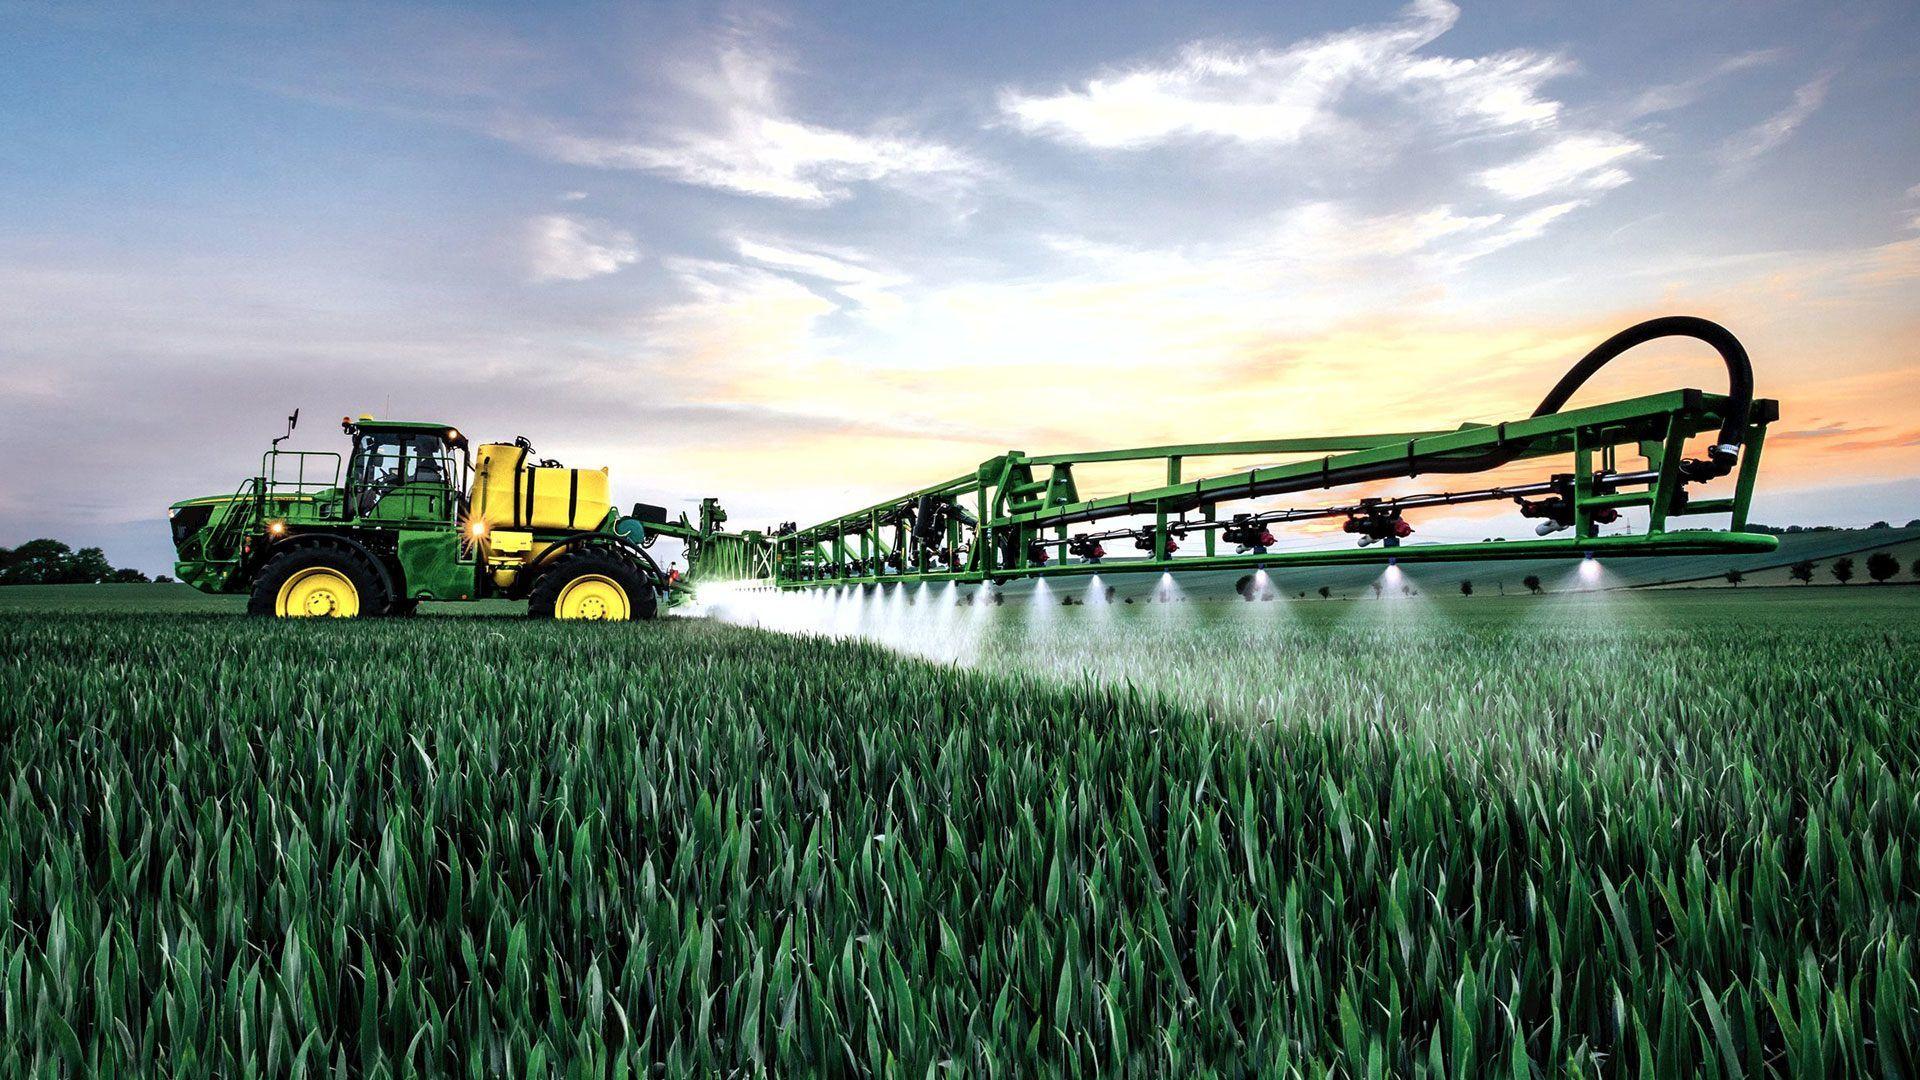 В Алматинской области построят завод по производству пестицидов - Kapital.kz